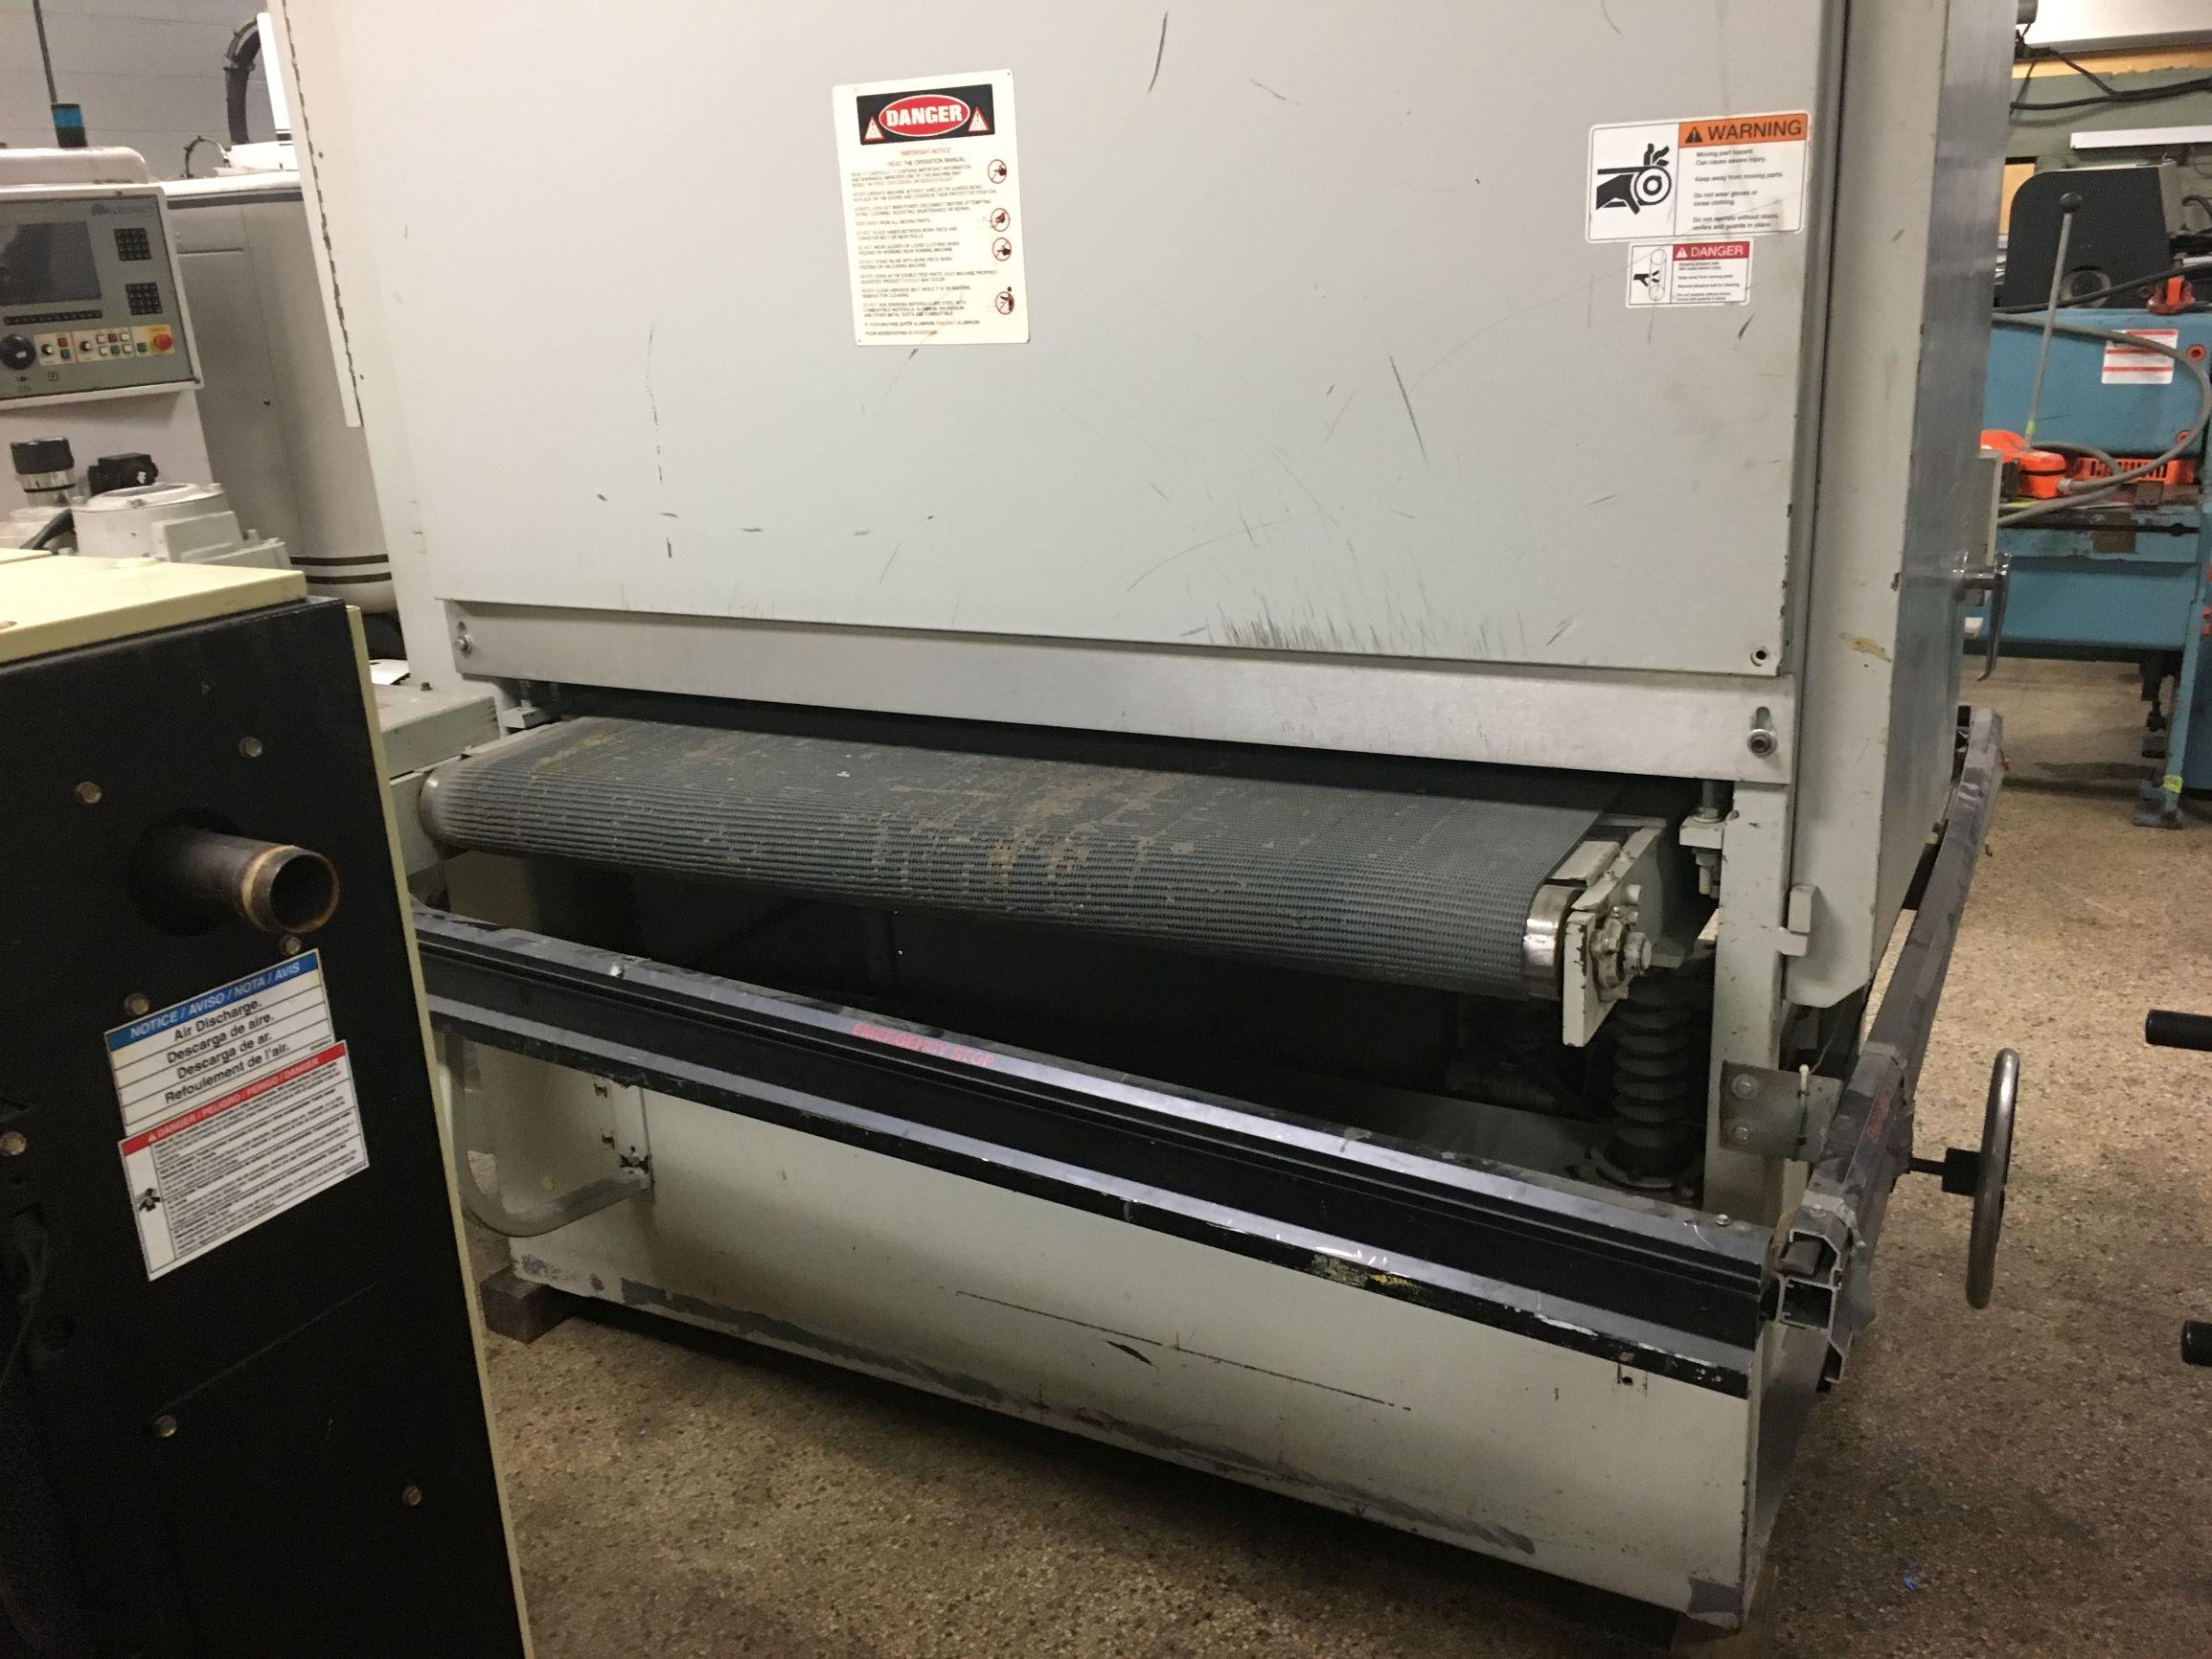 Timesaver Finishing Machine Sander, Model 252-1WW, S/N 25552T